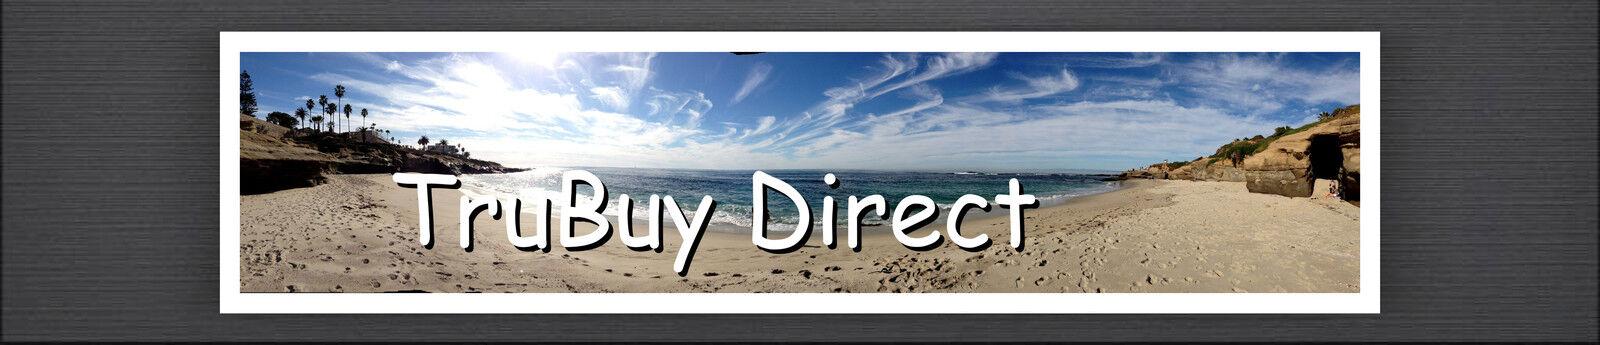 TruBuy Direct